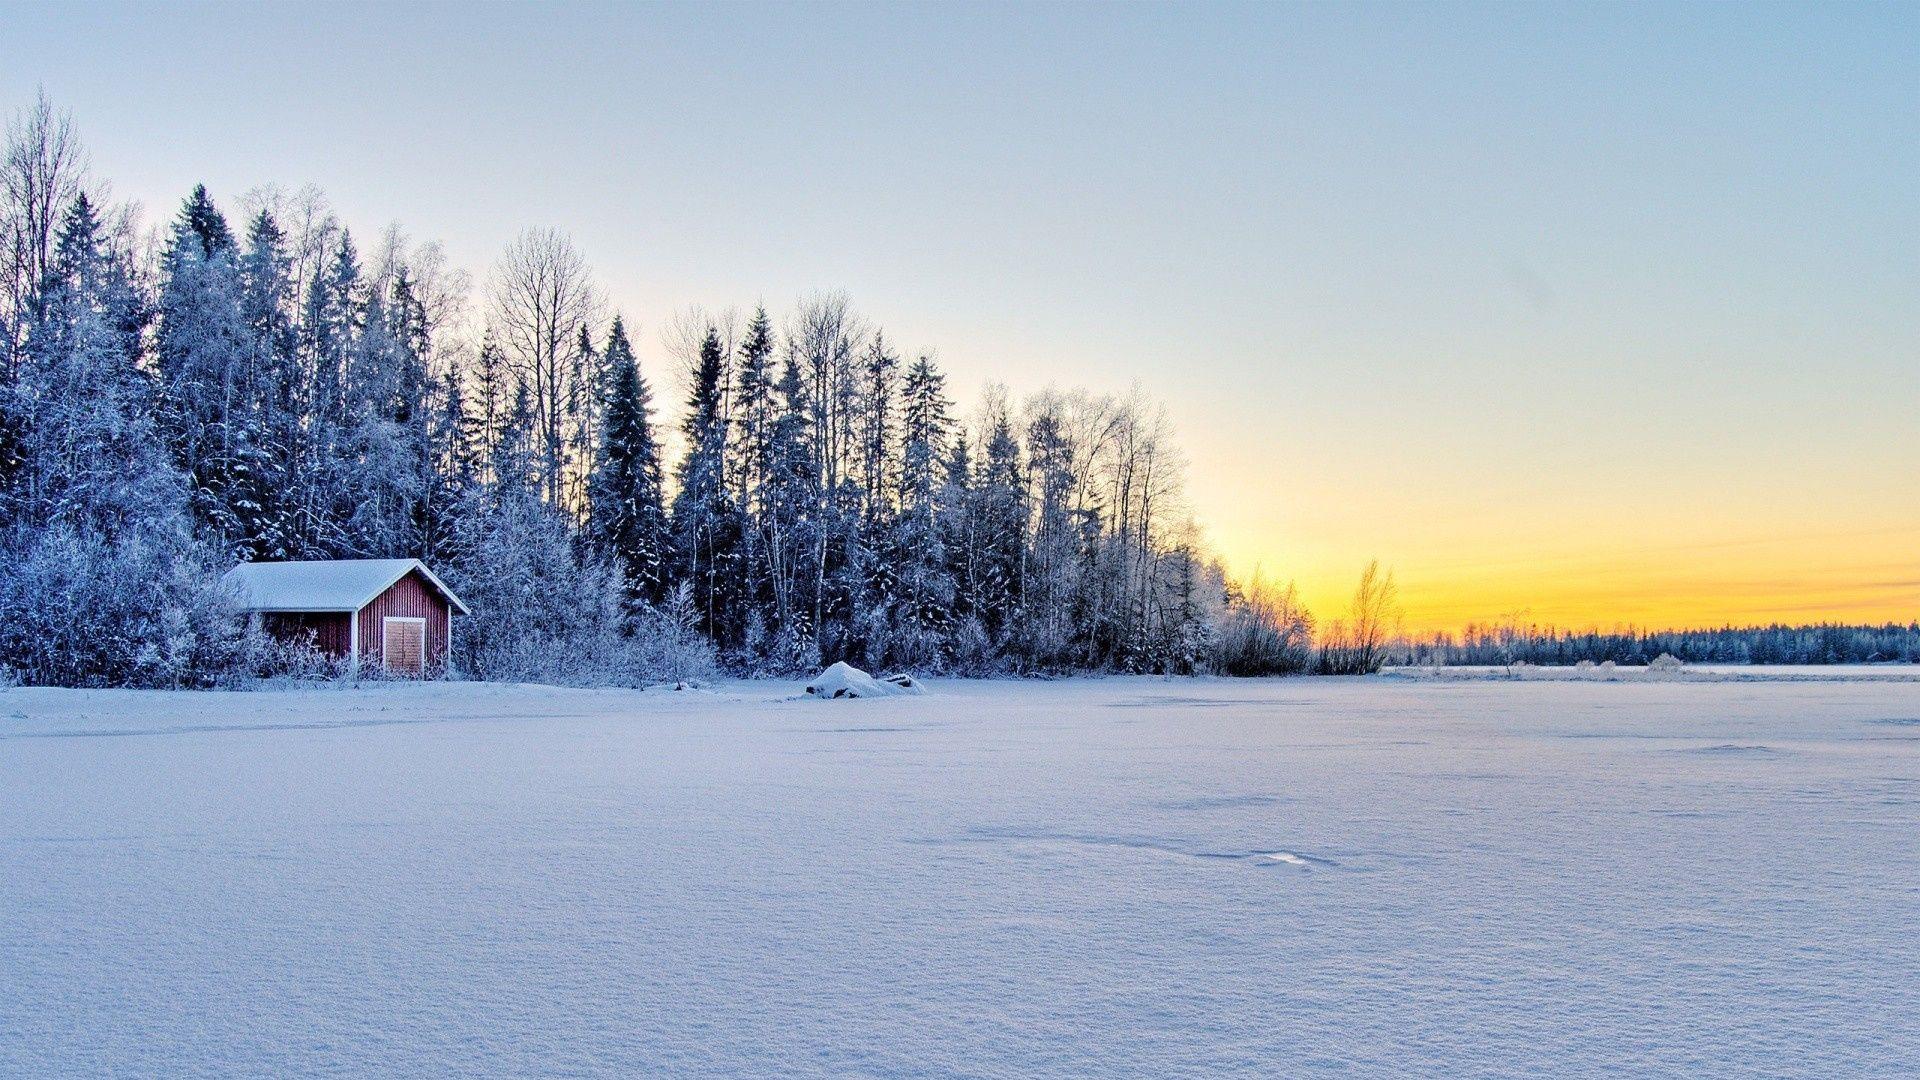 Winter Scene 1080p Wallpaper